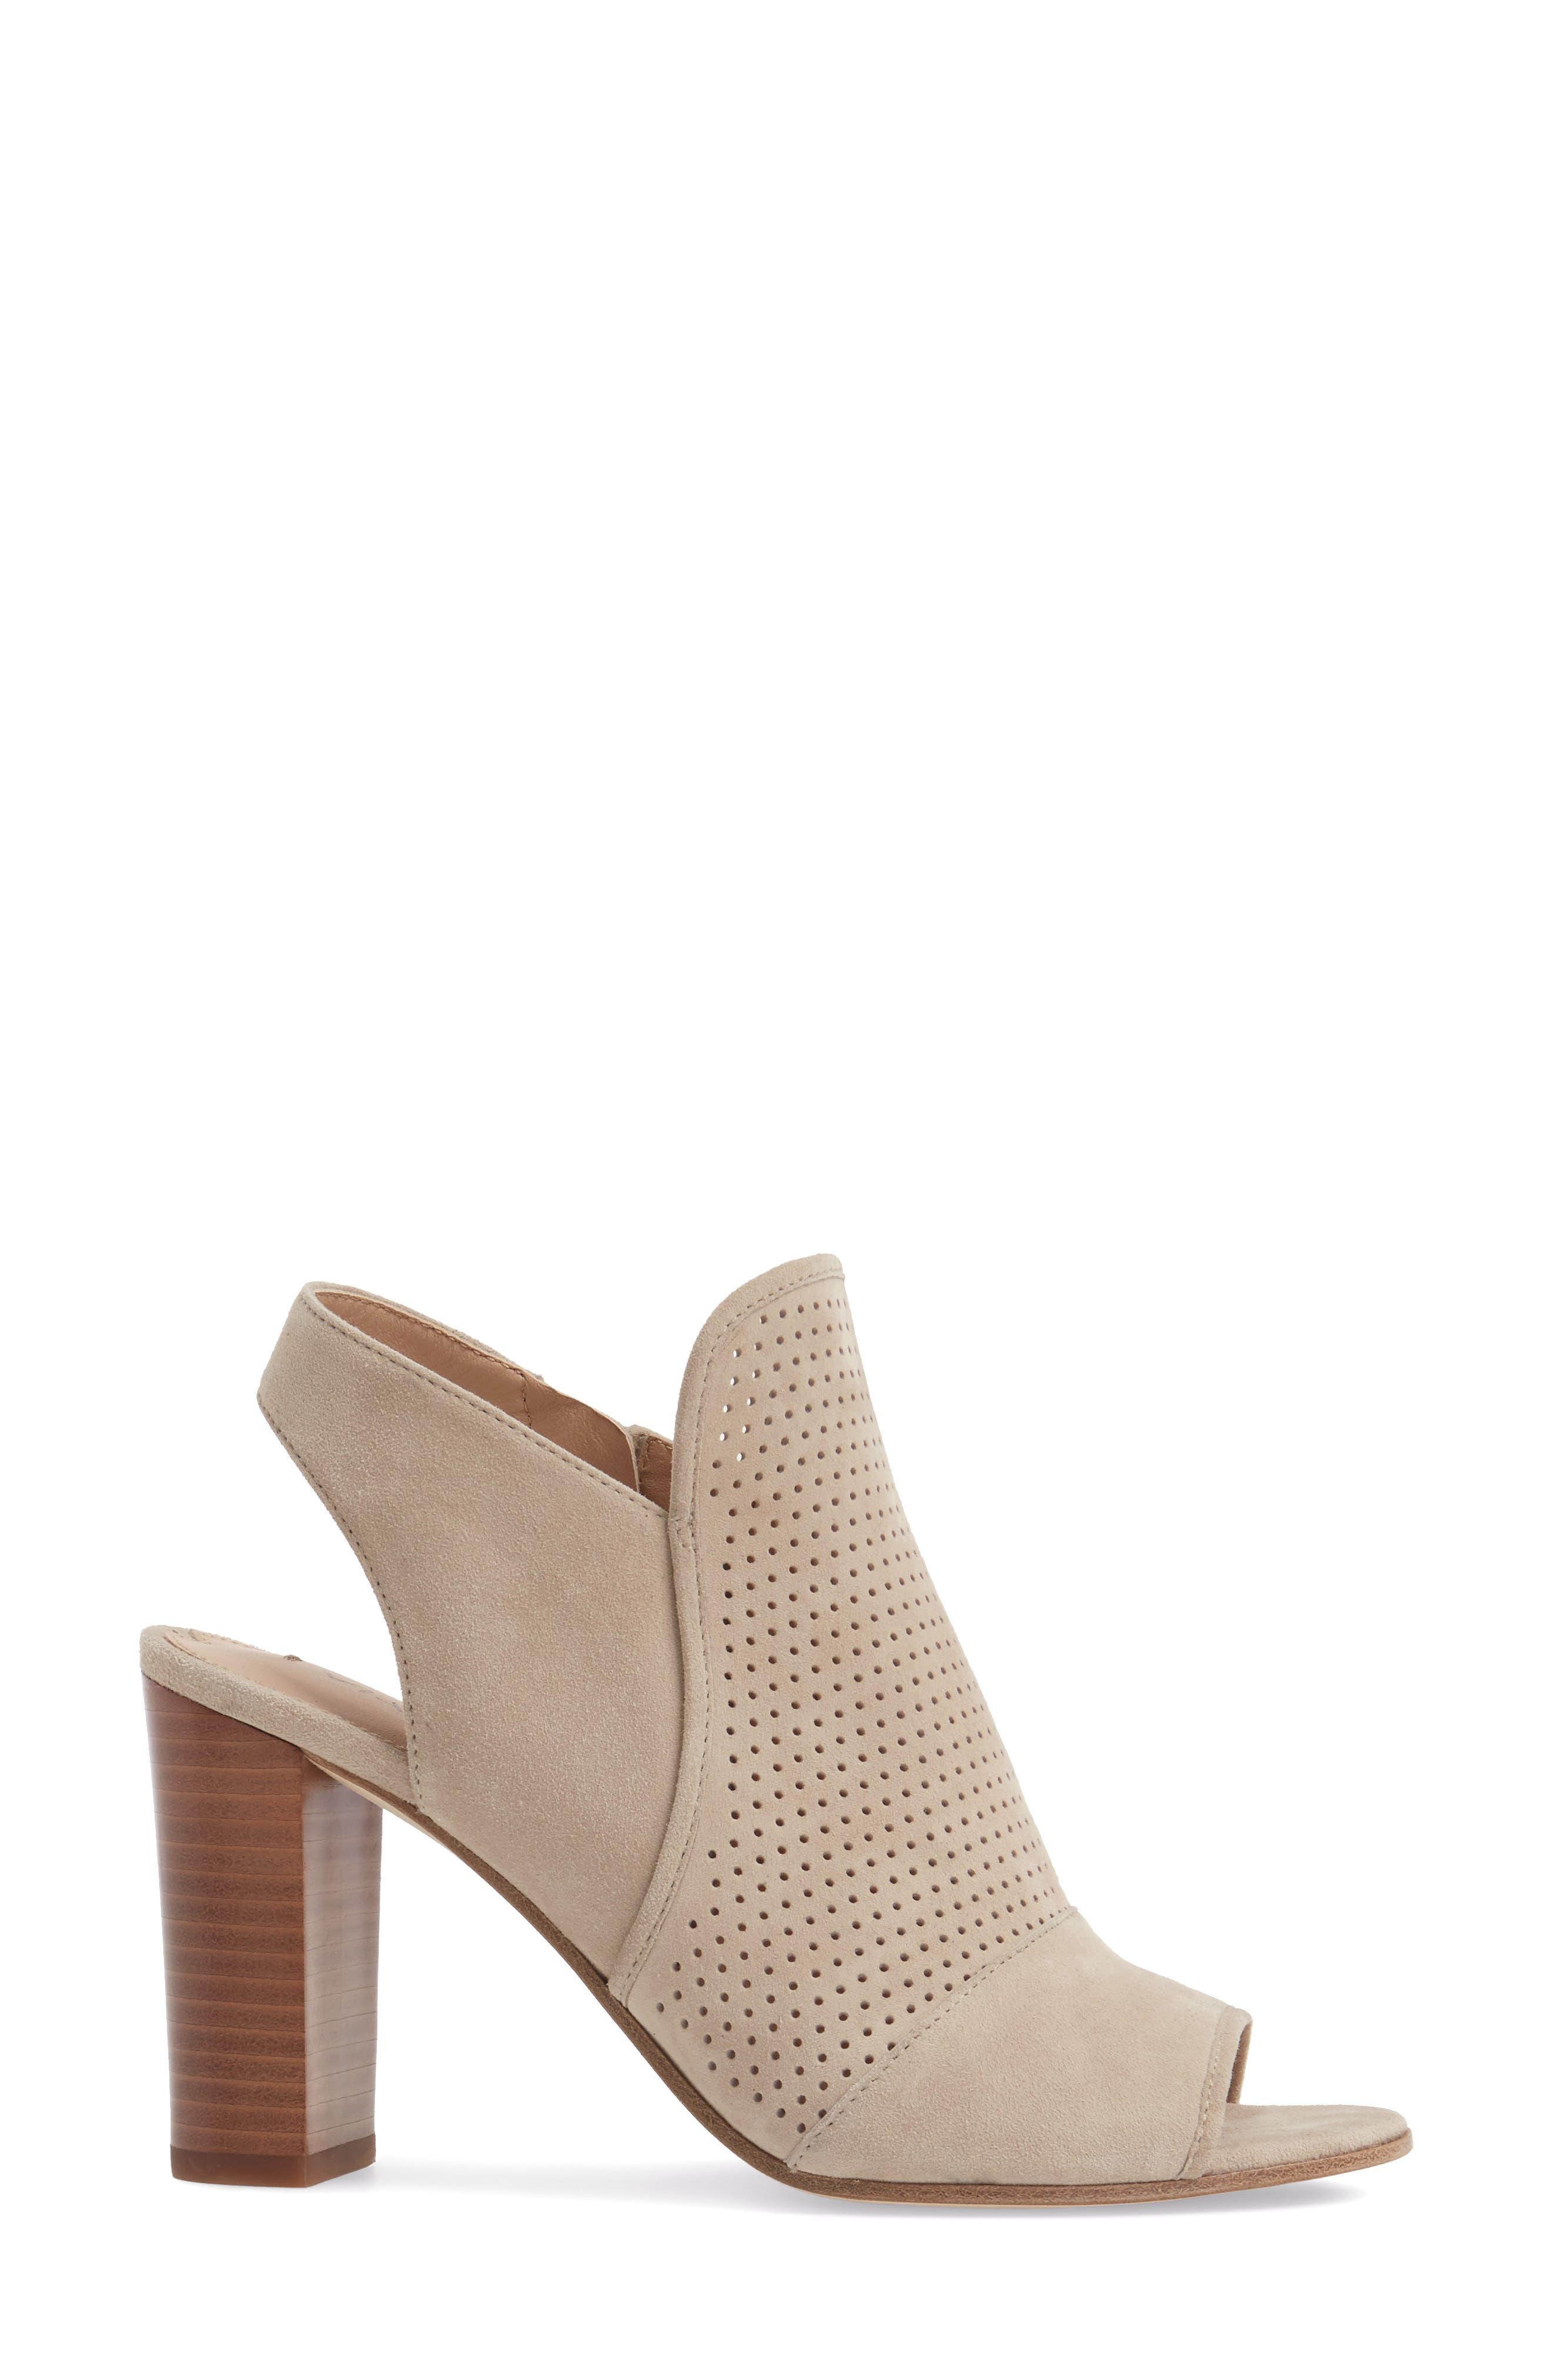 Alternate Image 3  - Via Spiga Gaze Block Heel Sandal (Women)